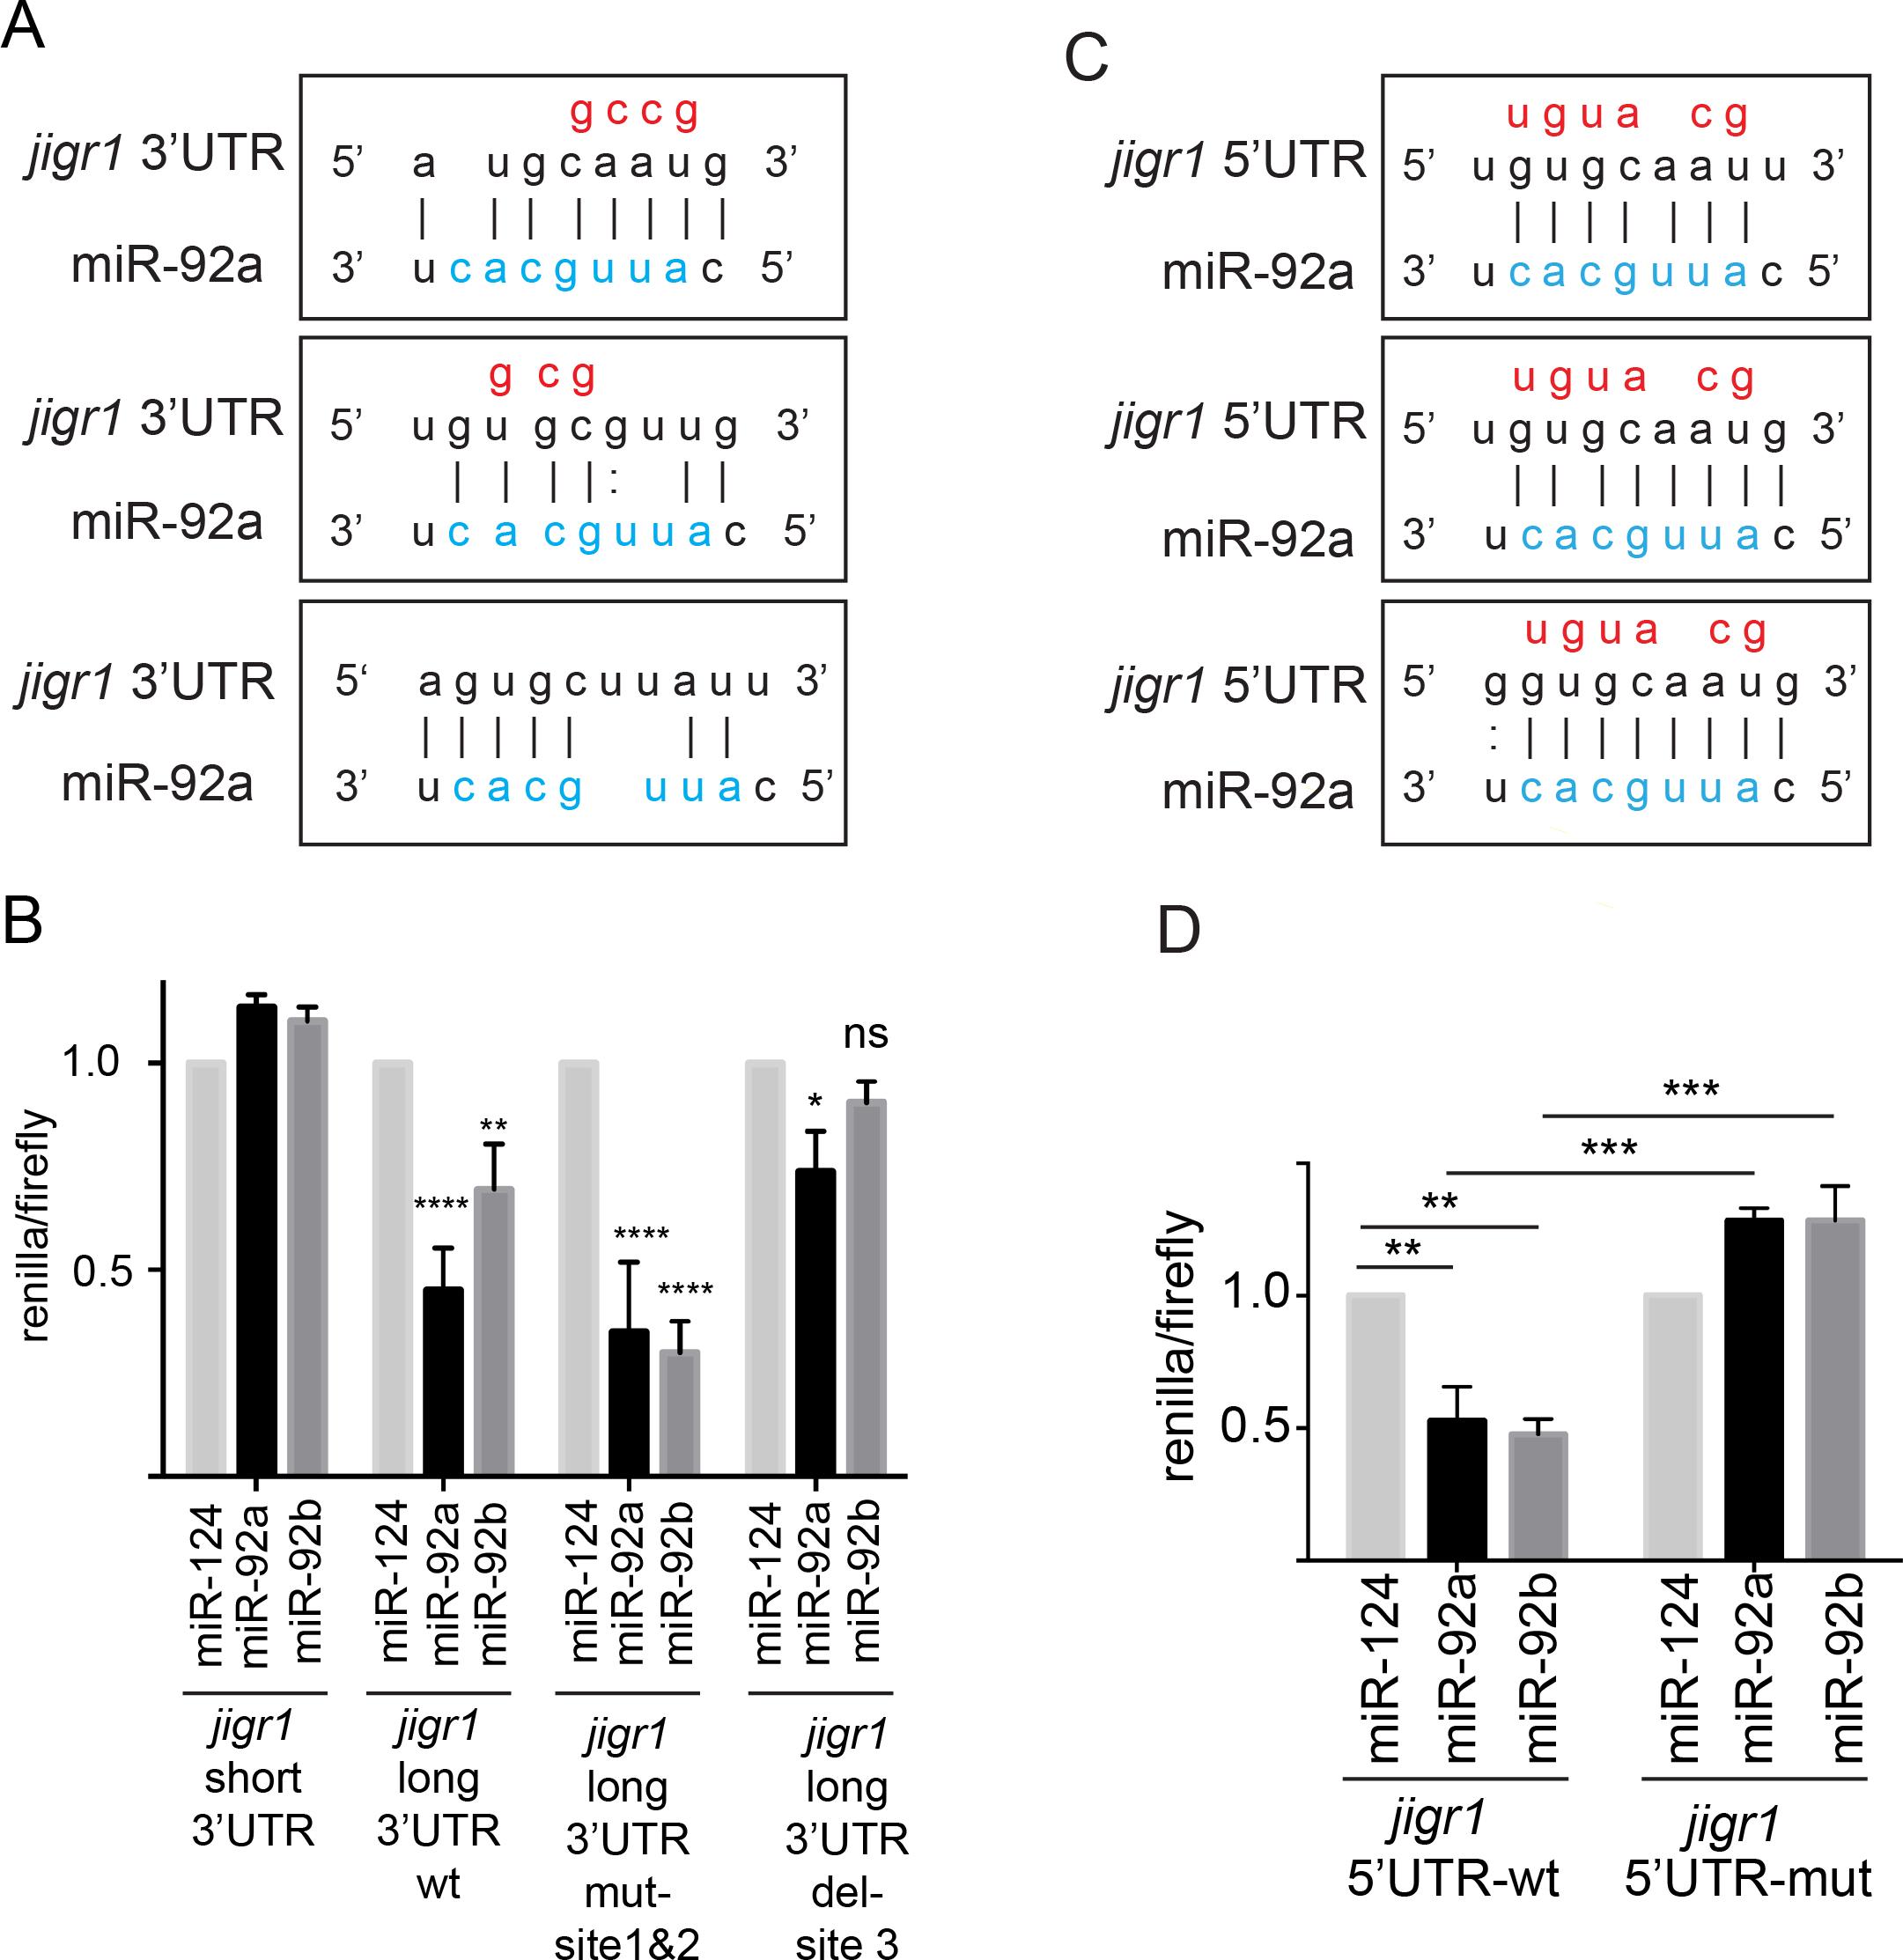 miR-92a and miR-92b target their host gene <i>jigr1</i>.